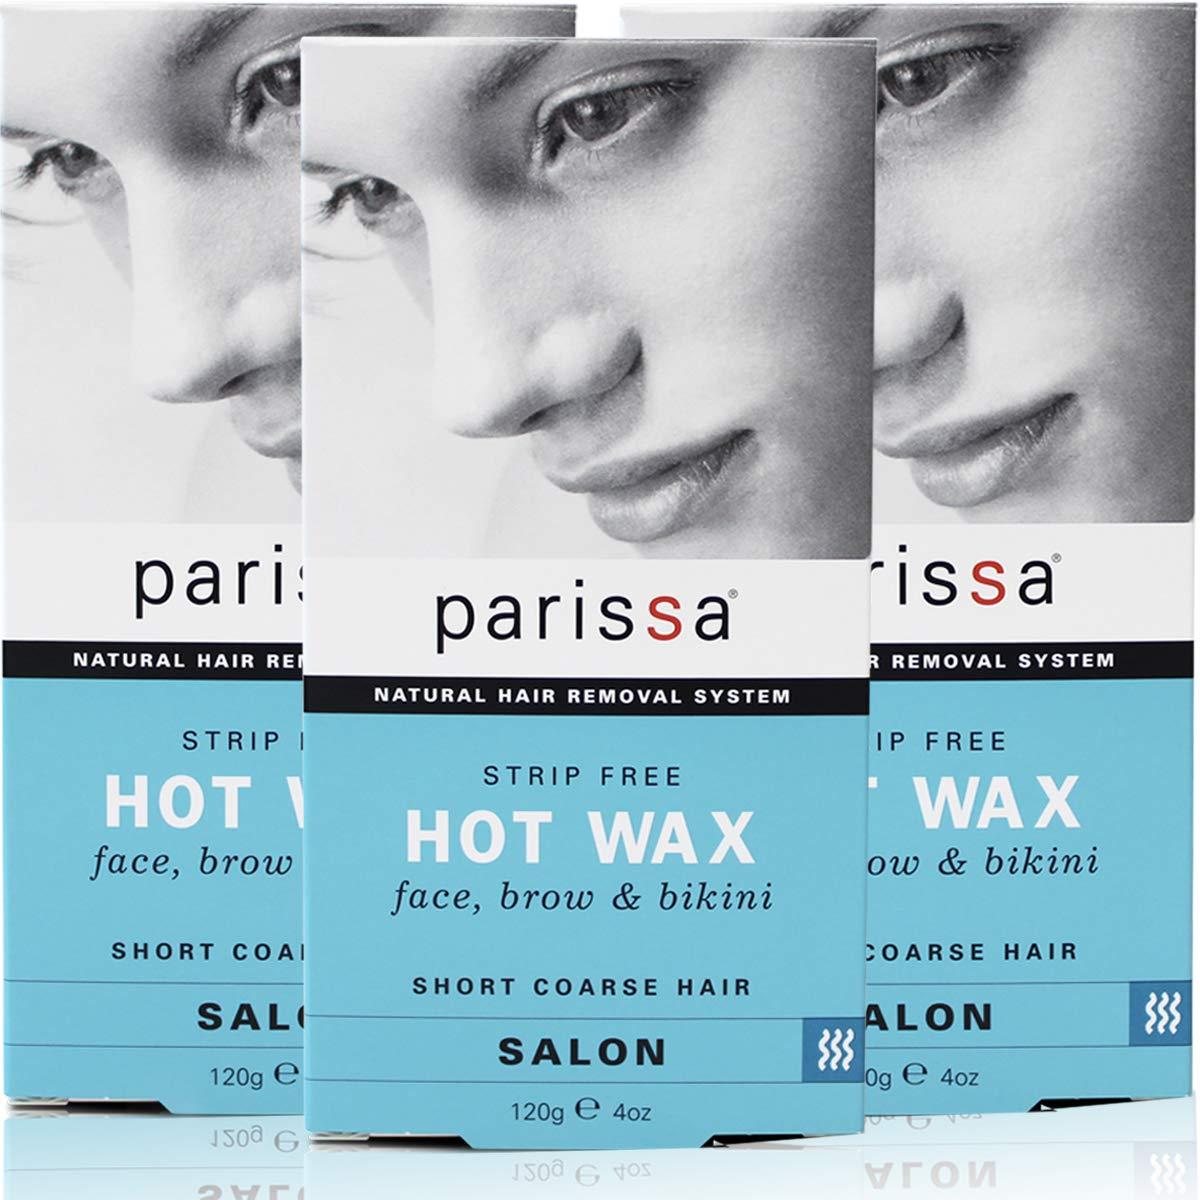 Parissa Salon Style Hot Hard Wax Strip-Free (120g), Pack Of 3